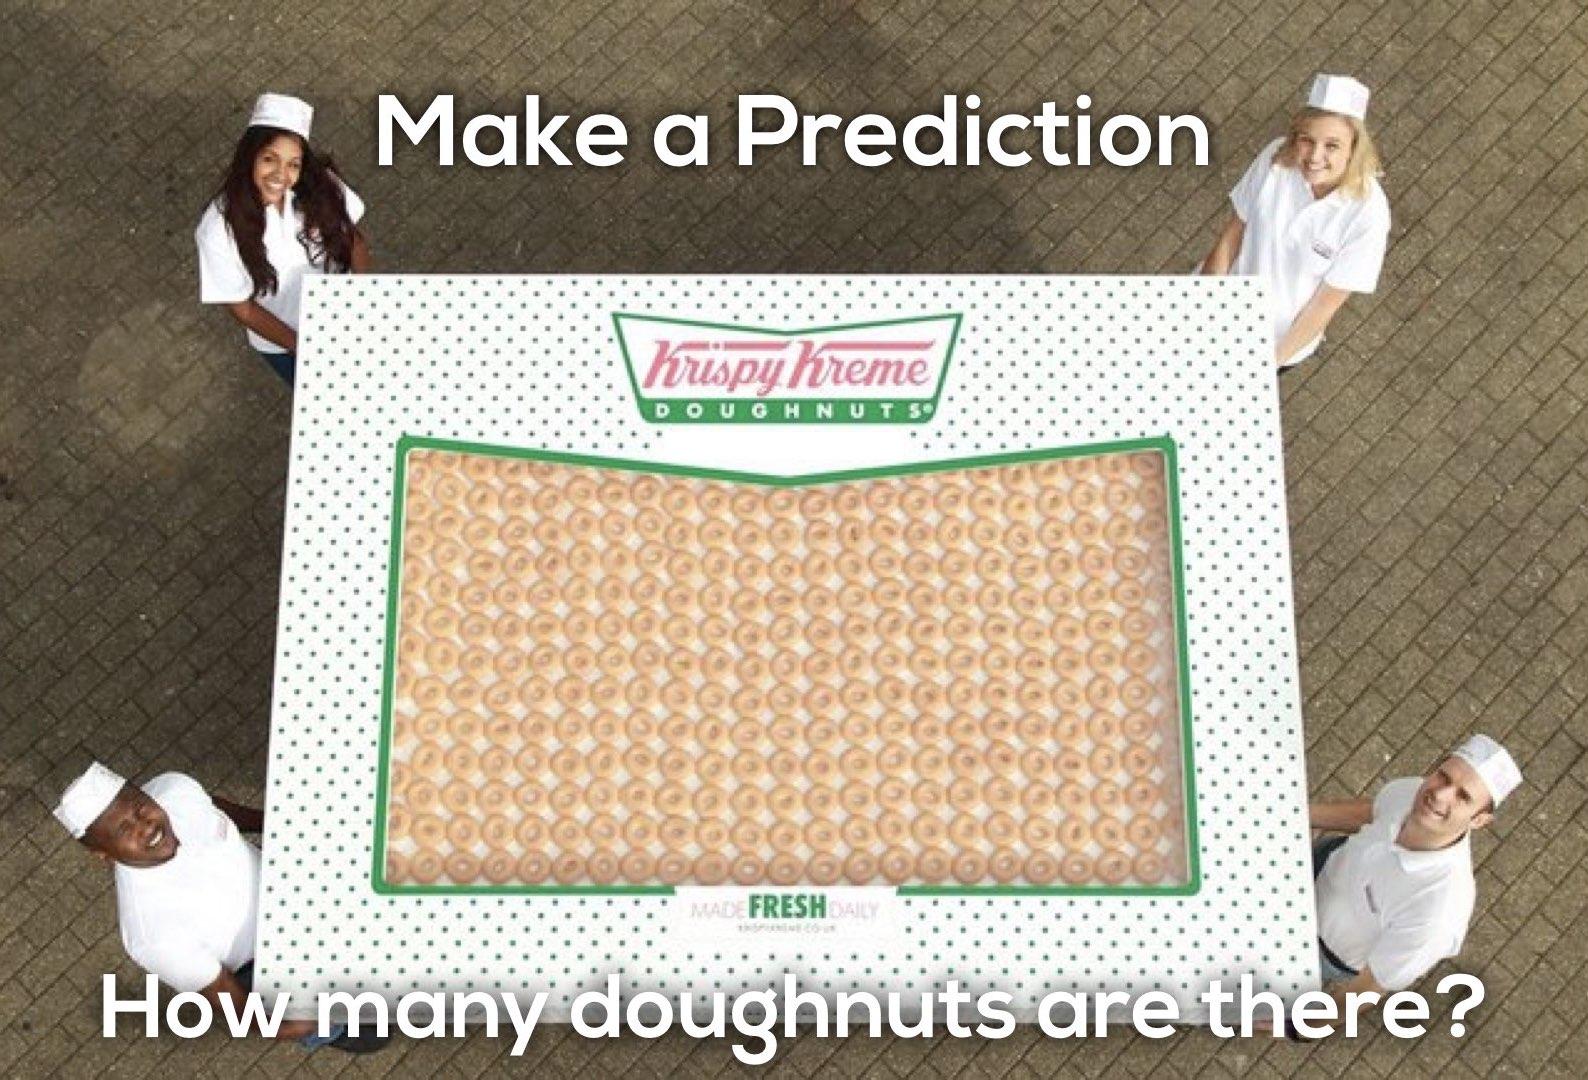 Krispy Kreme Donut Delight 3 Act Math Task - Make a Prediction